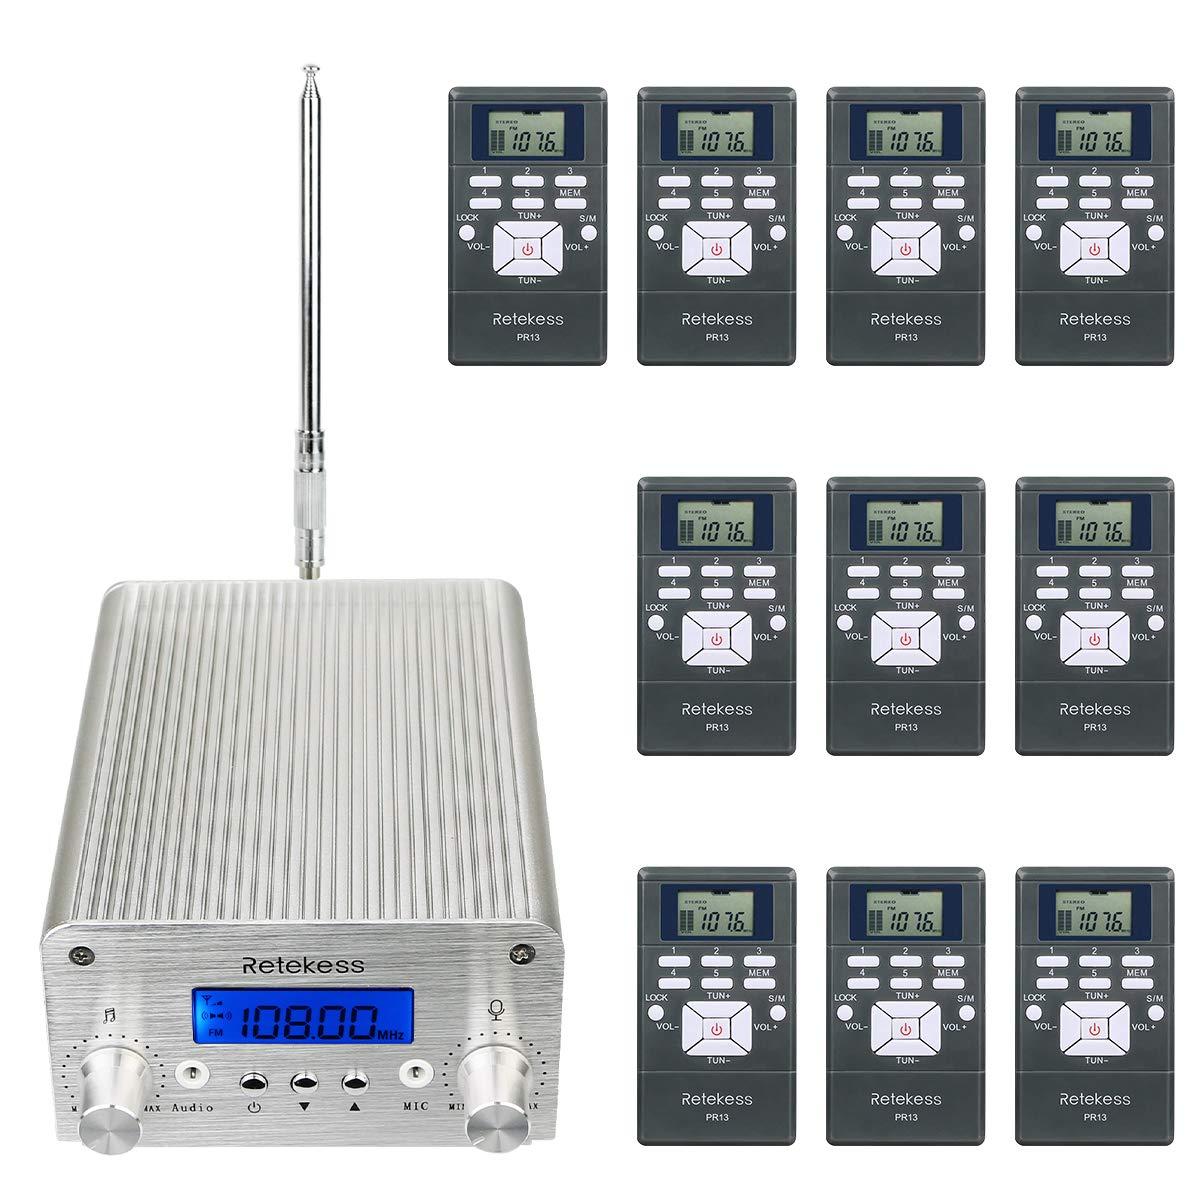 Retekess TR501 1W 6W FM Transmitter Long Range Wireless Listening Center with 10 PR13 FM Radio Receivers for Factory Church Classroom School by Retekess